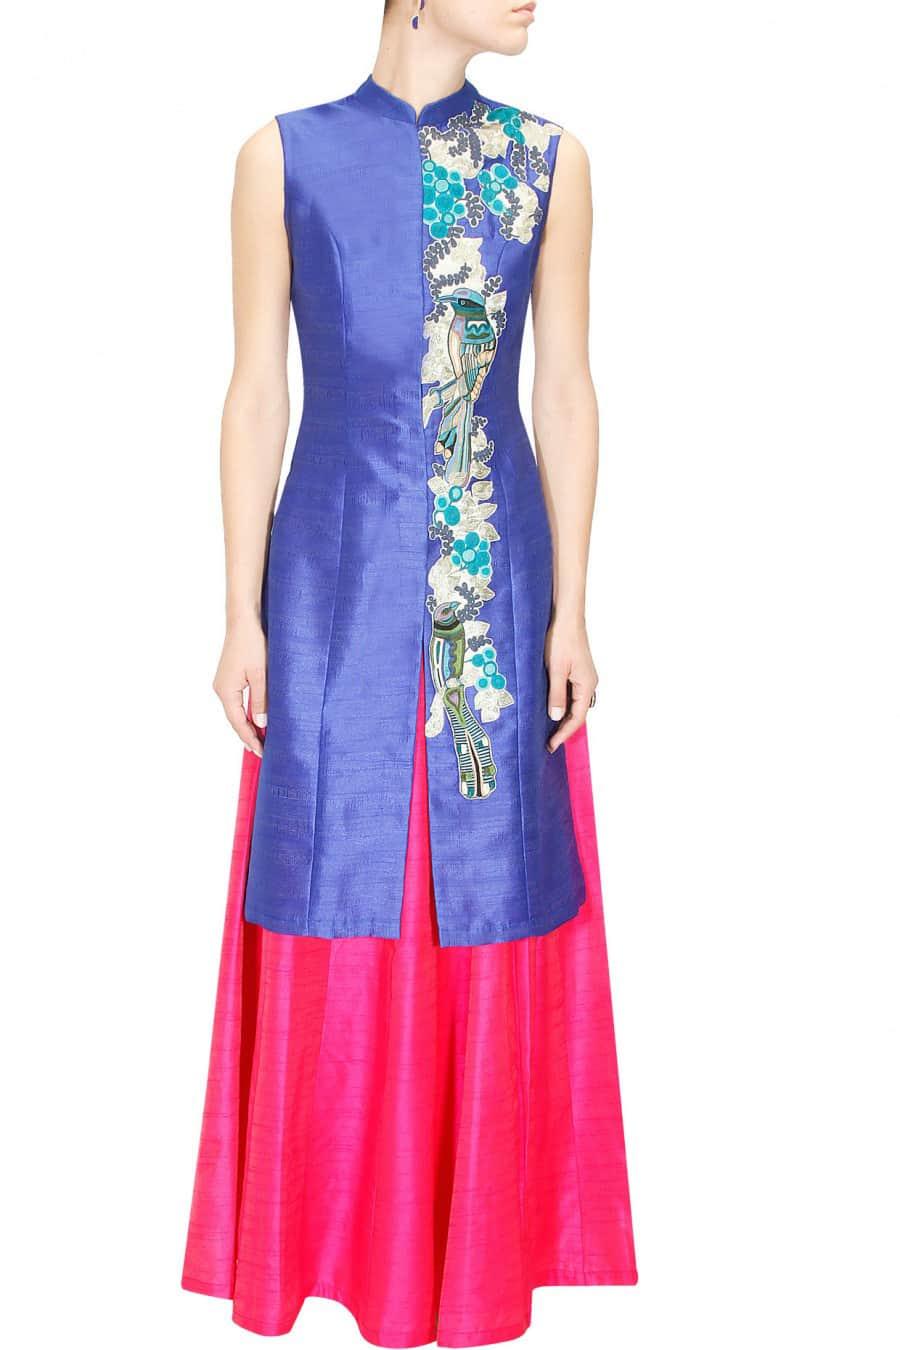 Blue achkan with lehanga skirt